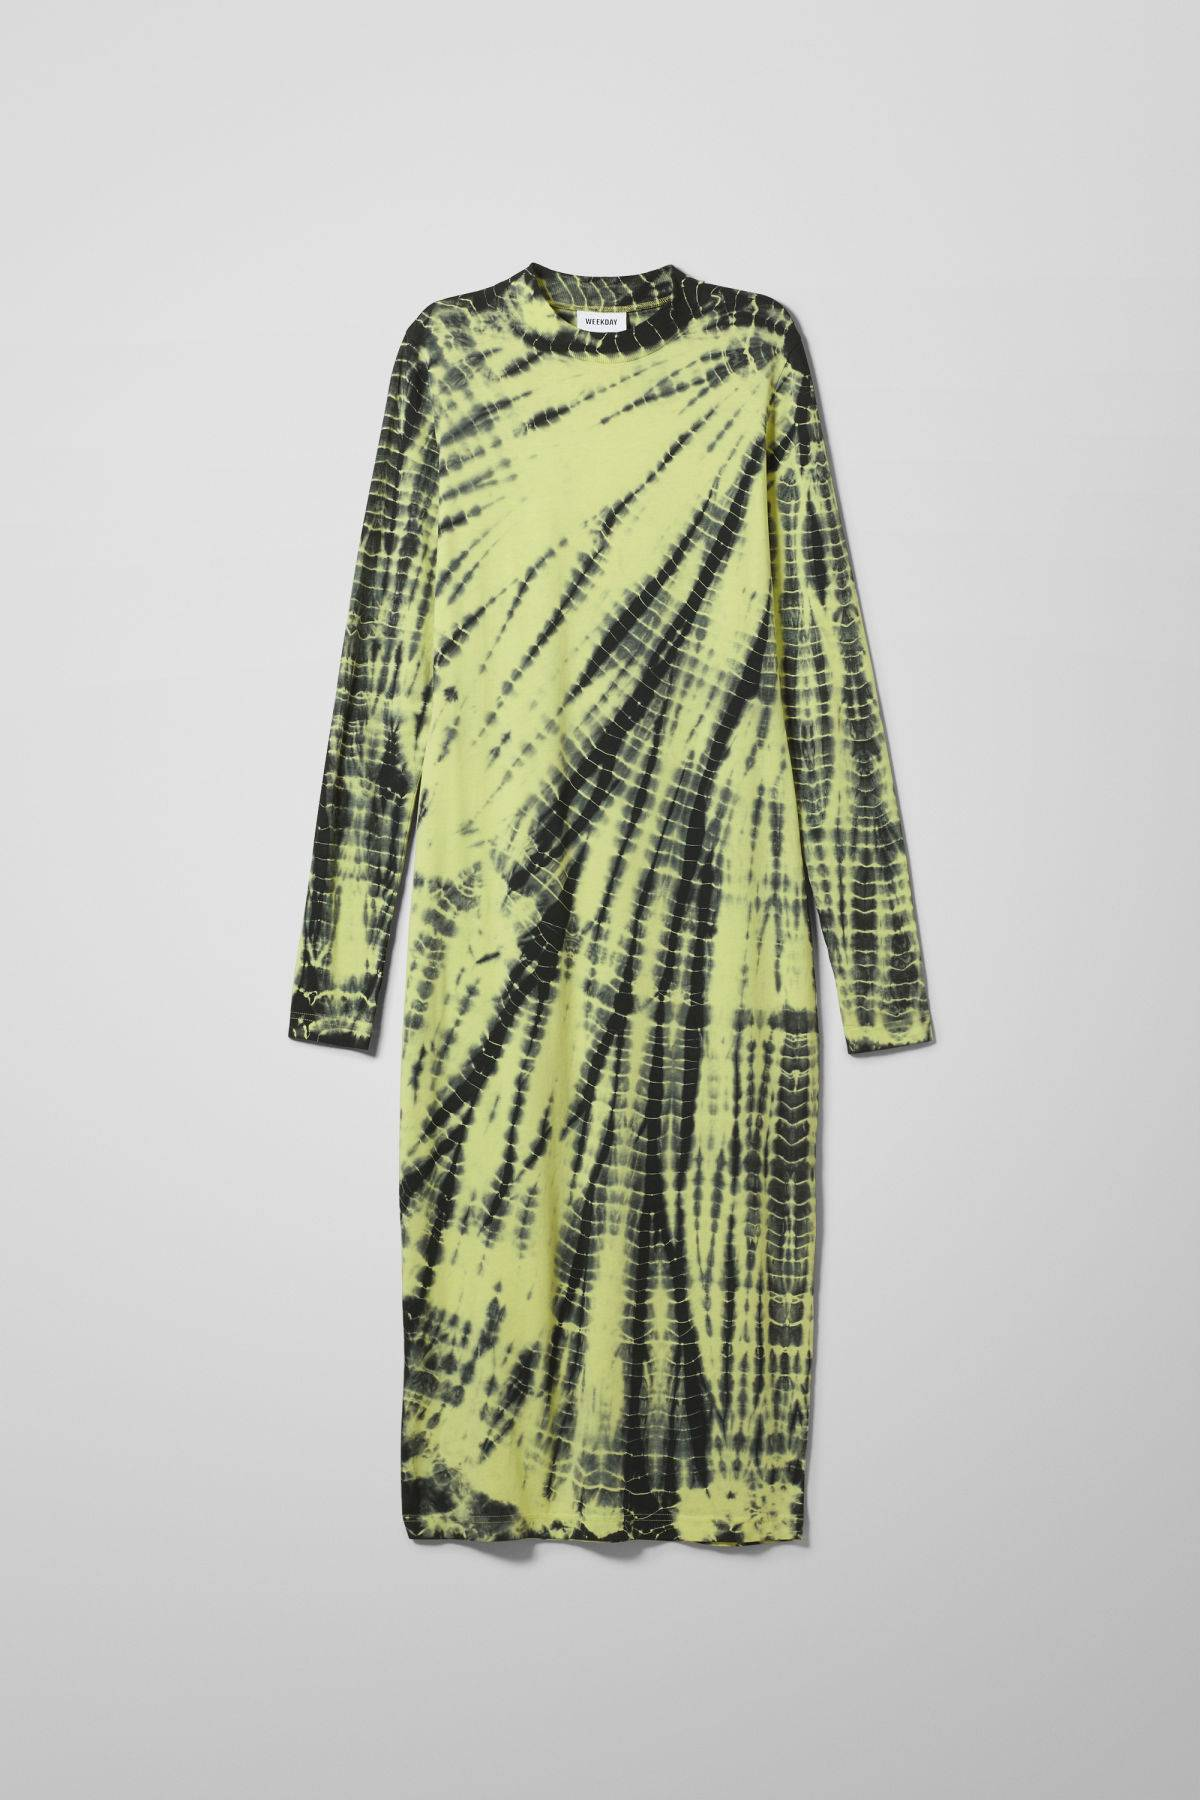 Image of Meja Dress - Yellow-M